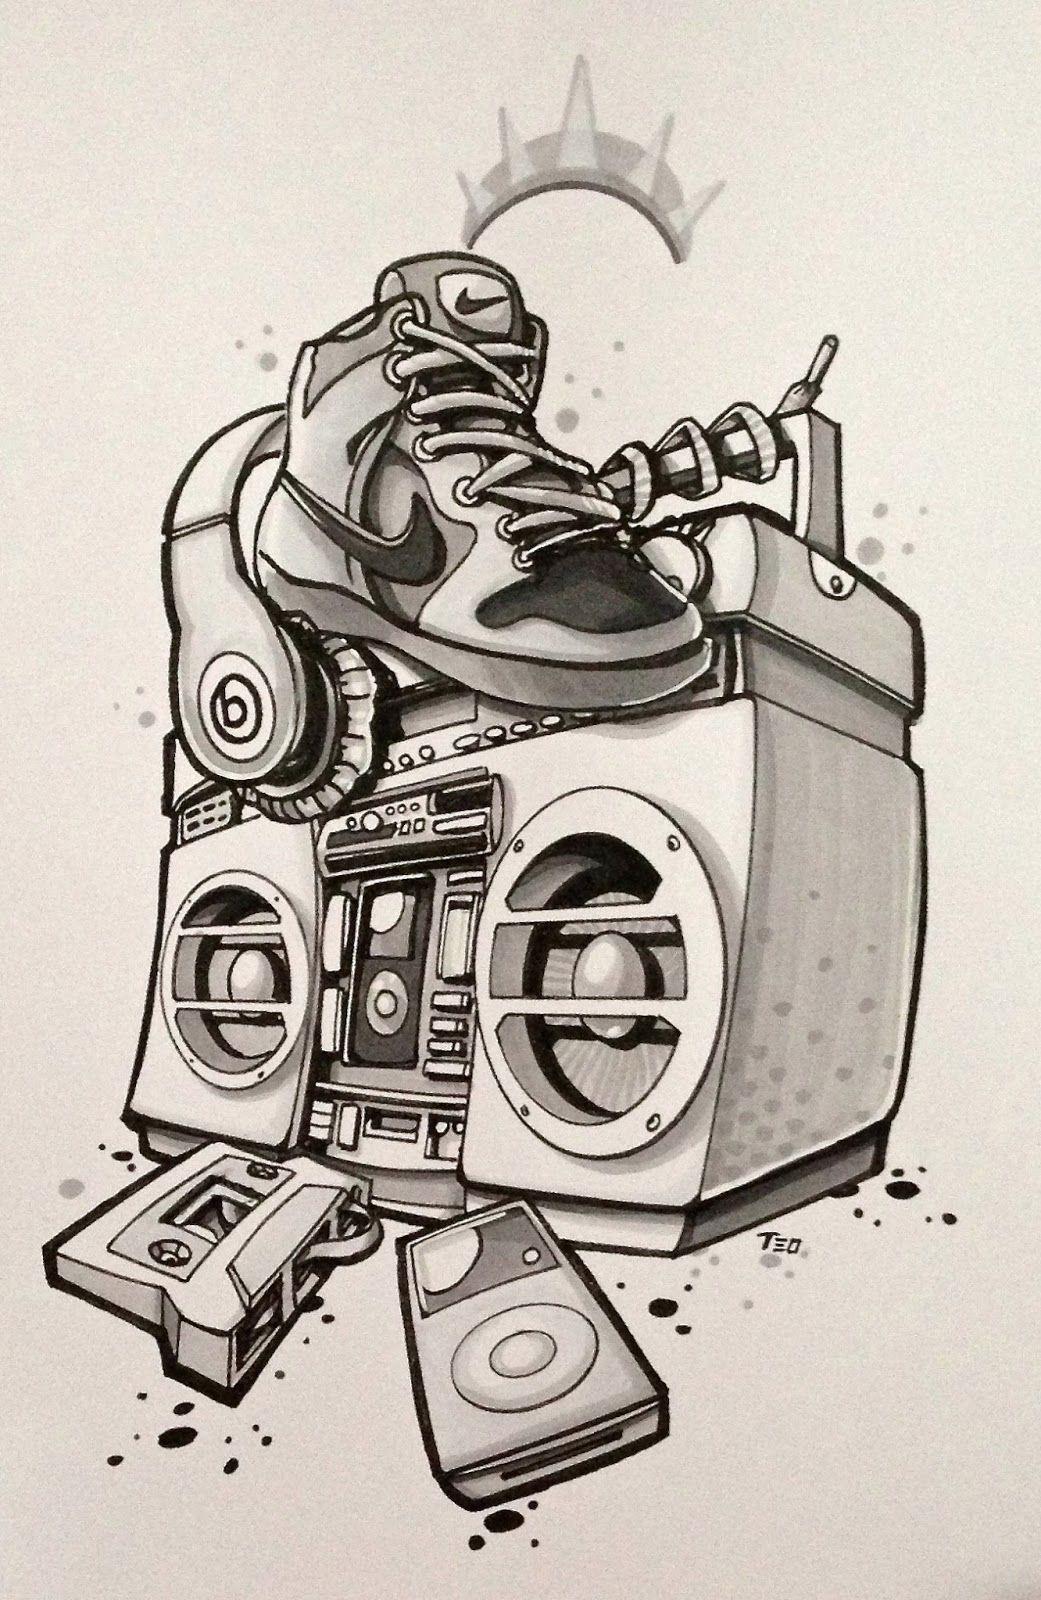 hop tattoo ideas hip hop tattoo hip hop tattoo designs